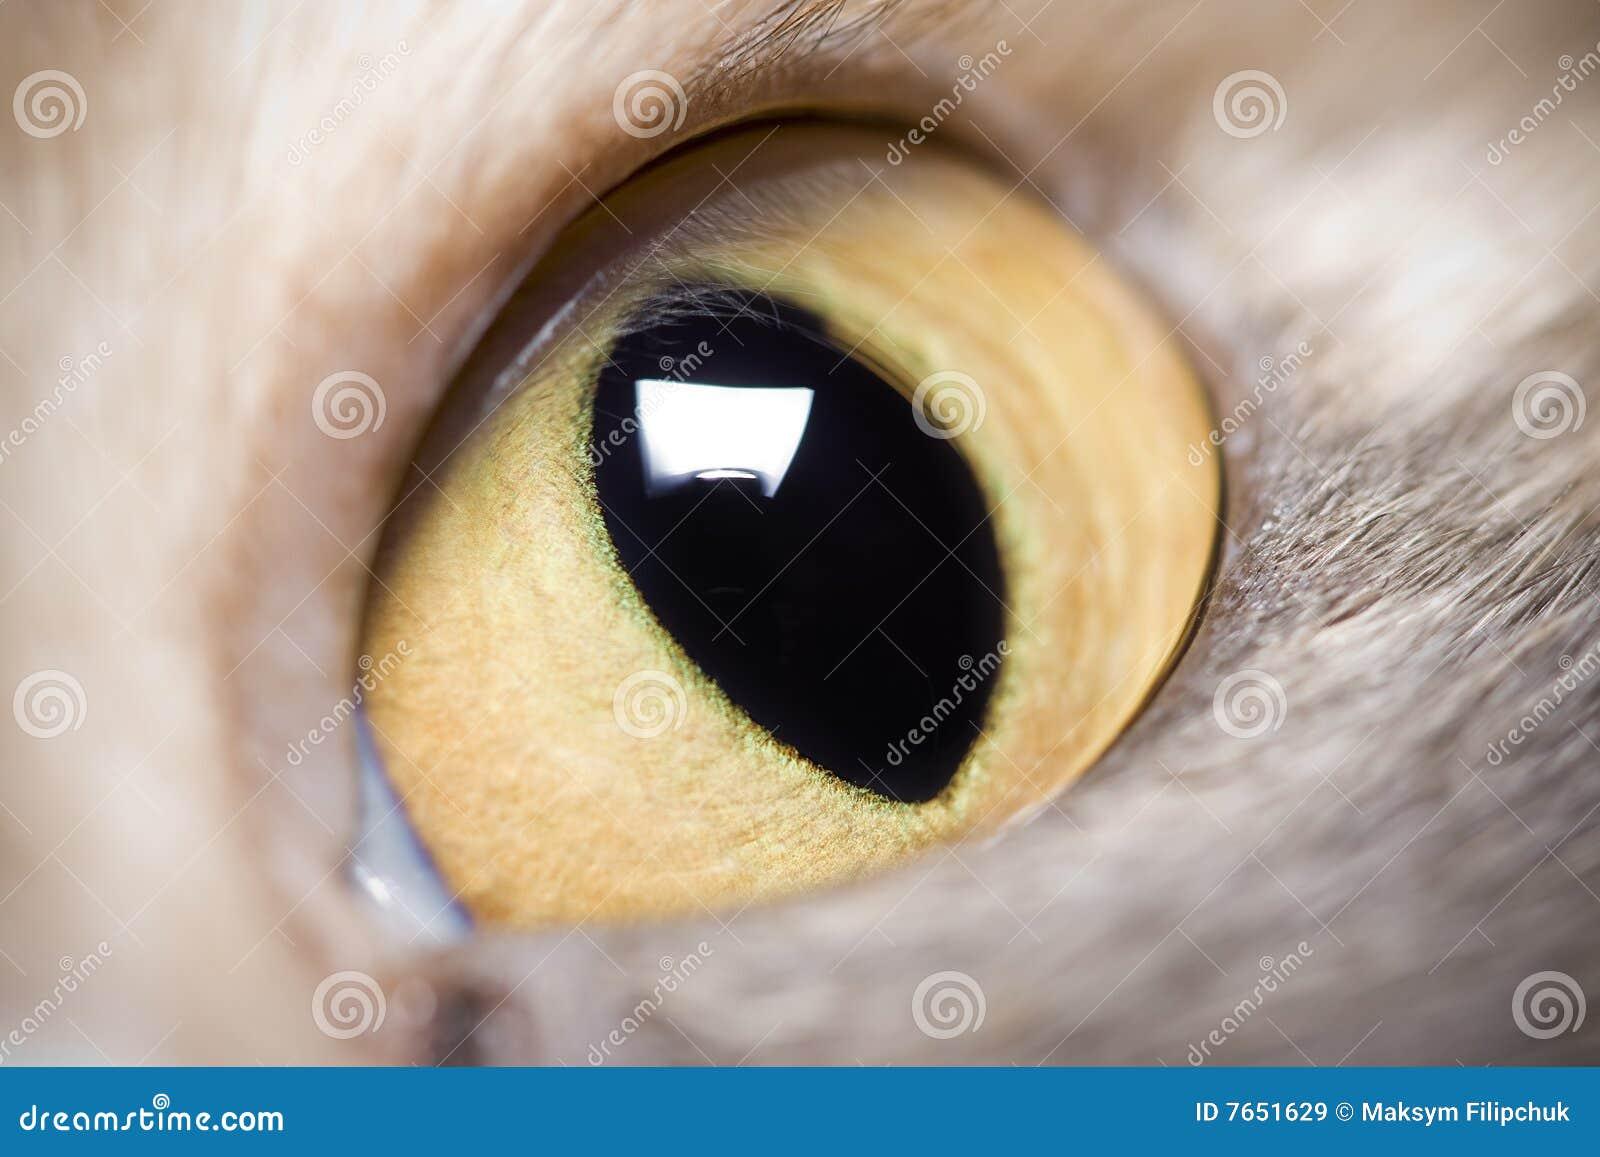 Animal Eye Royalty Free Stock Images - Image: 7651629